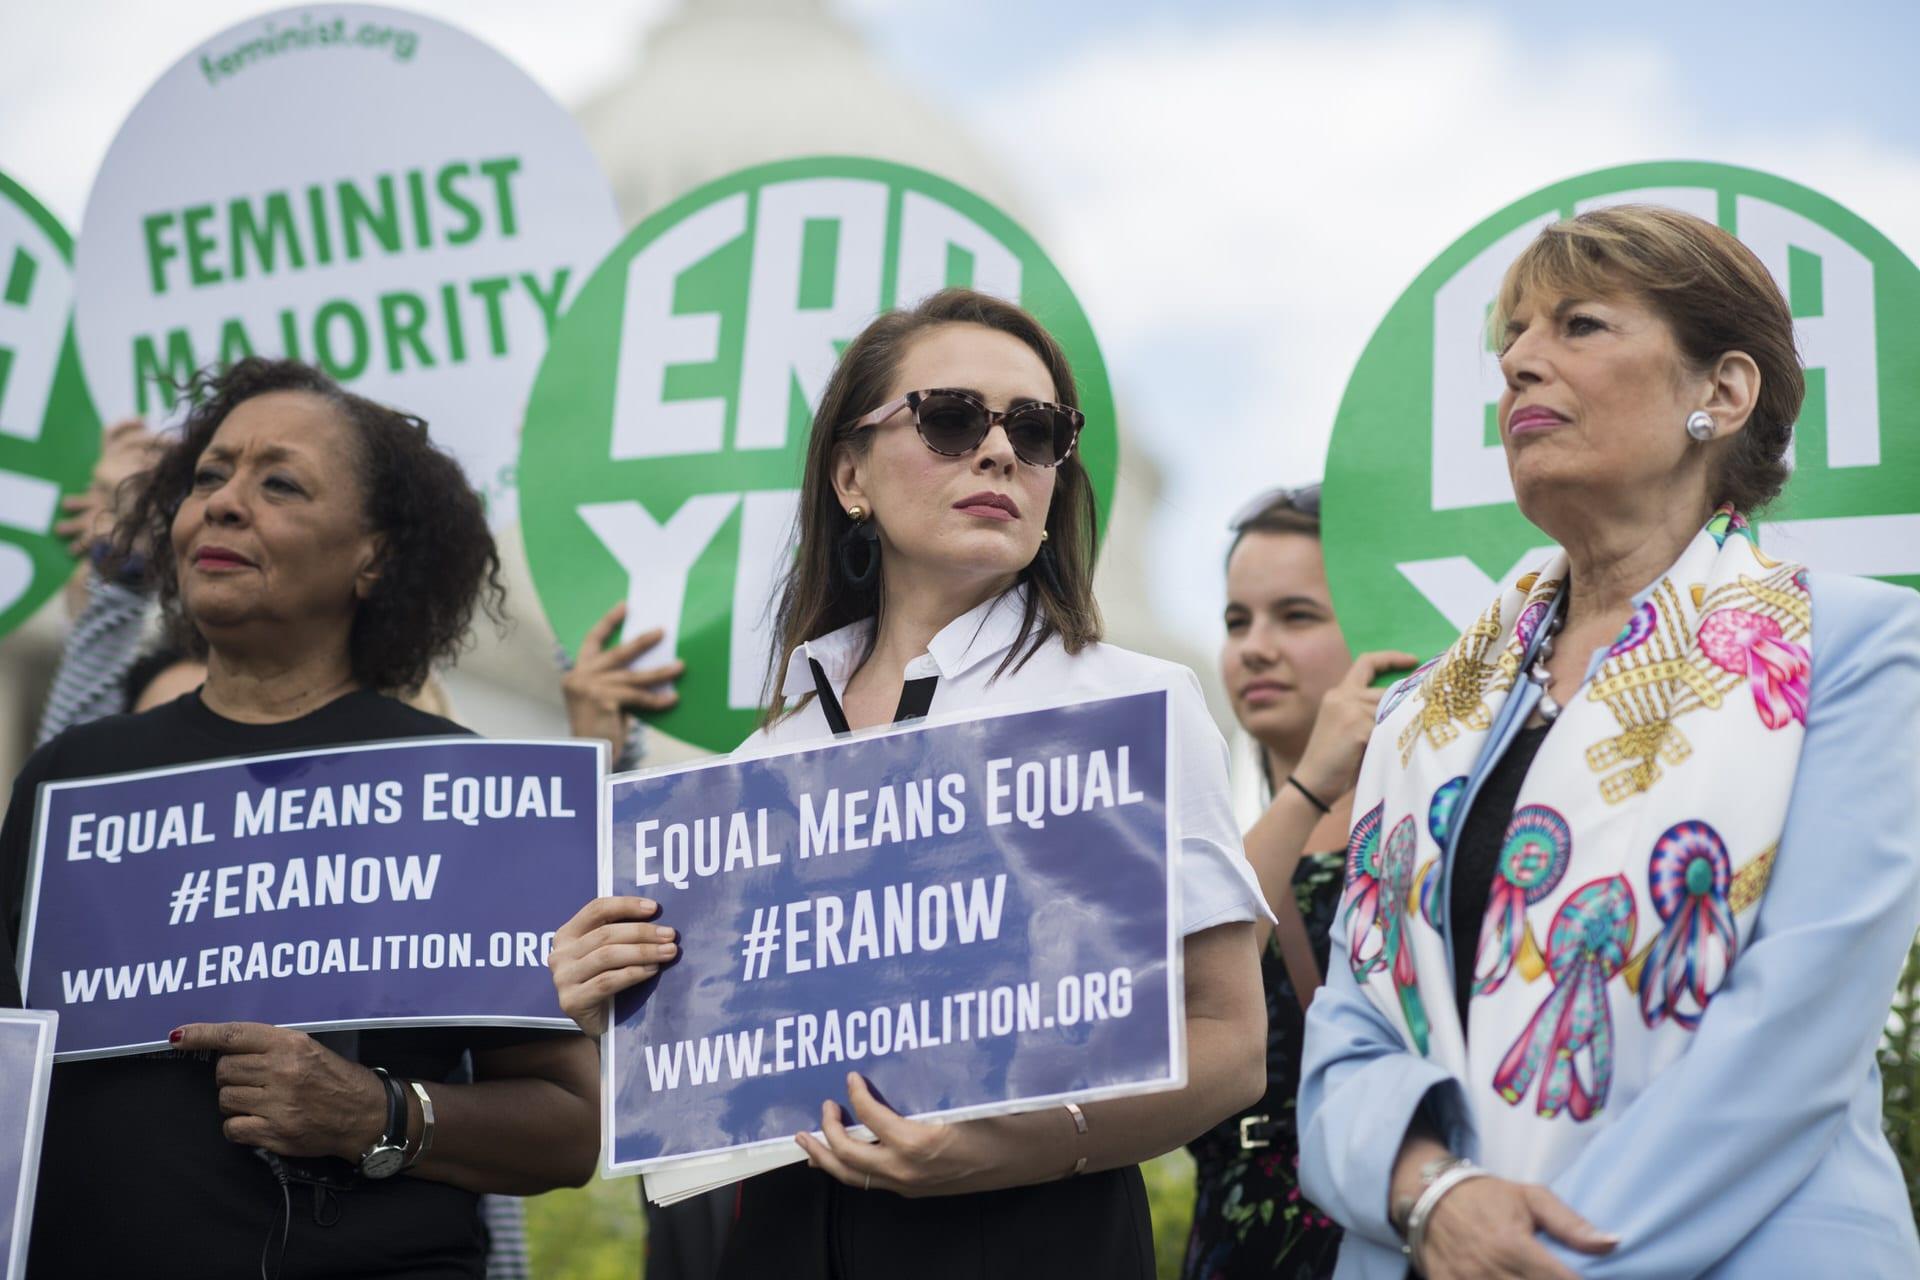 Federal judge dismisses legal effort to recognize Equal Rights Amendment